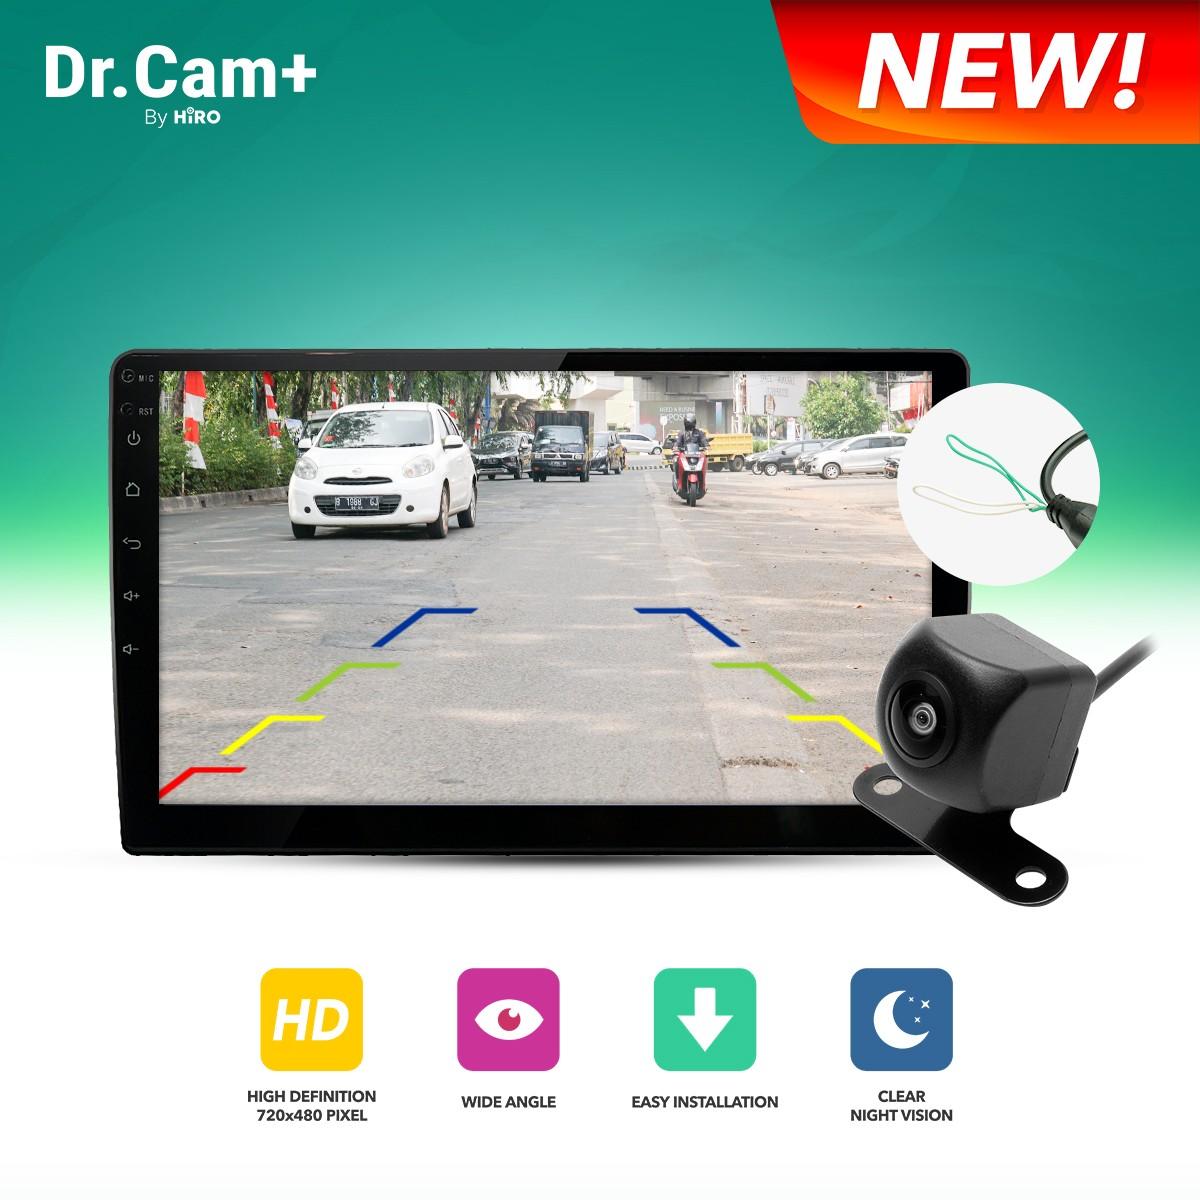 Dr.CAM+ Kamera Mundur 720p